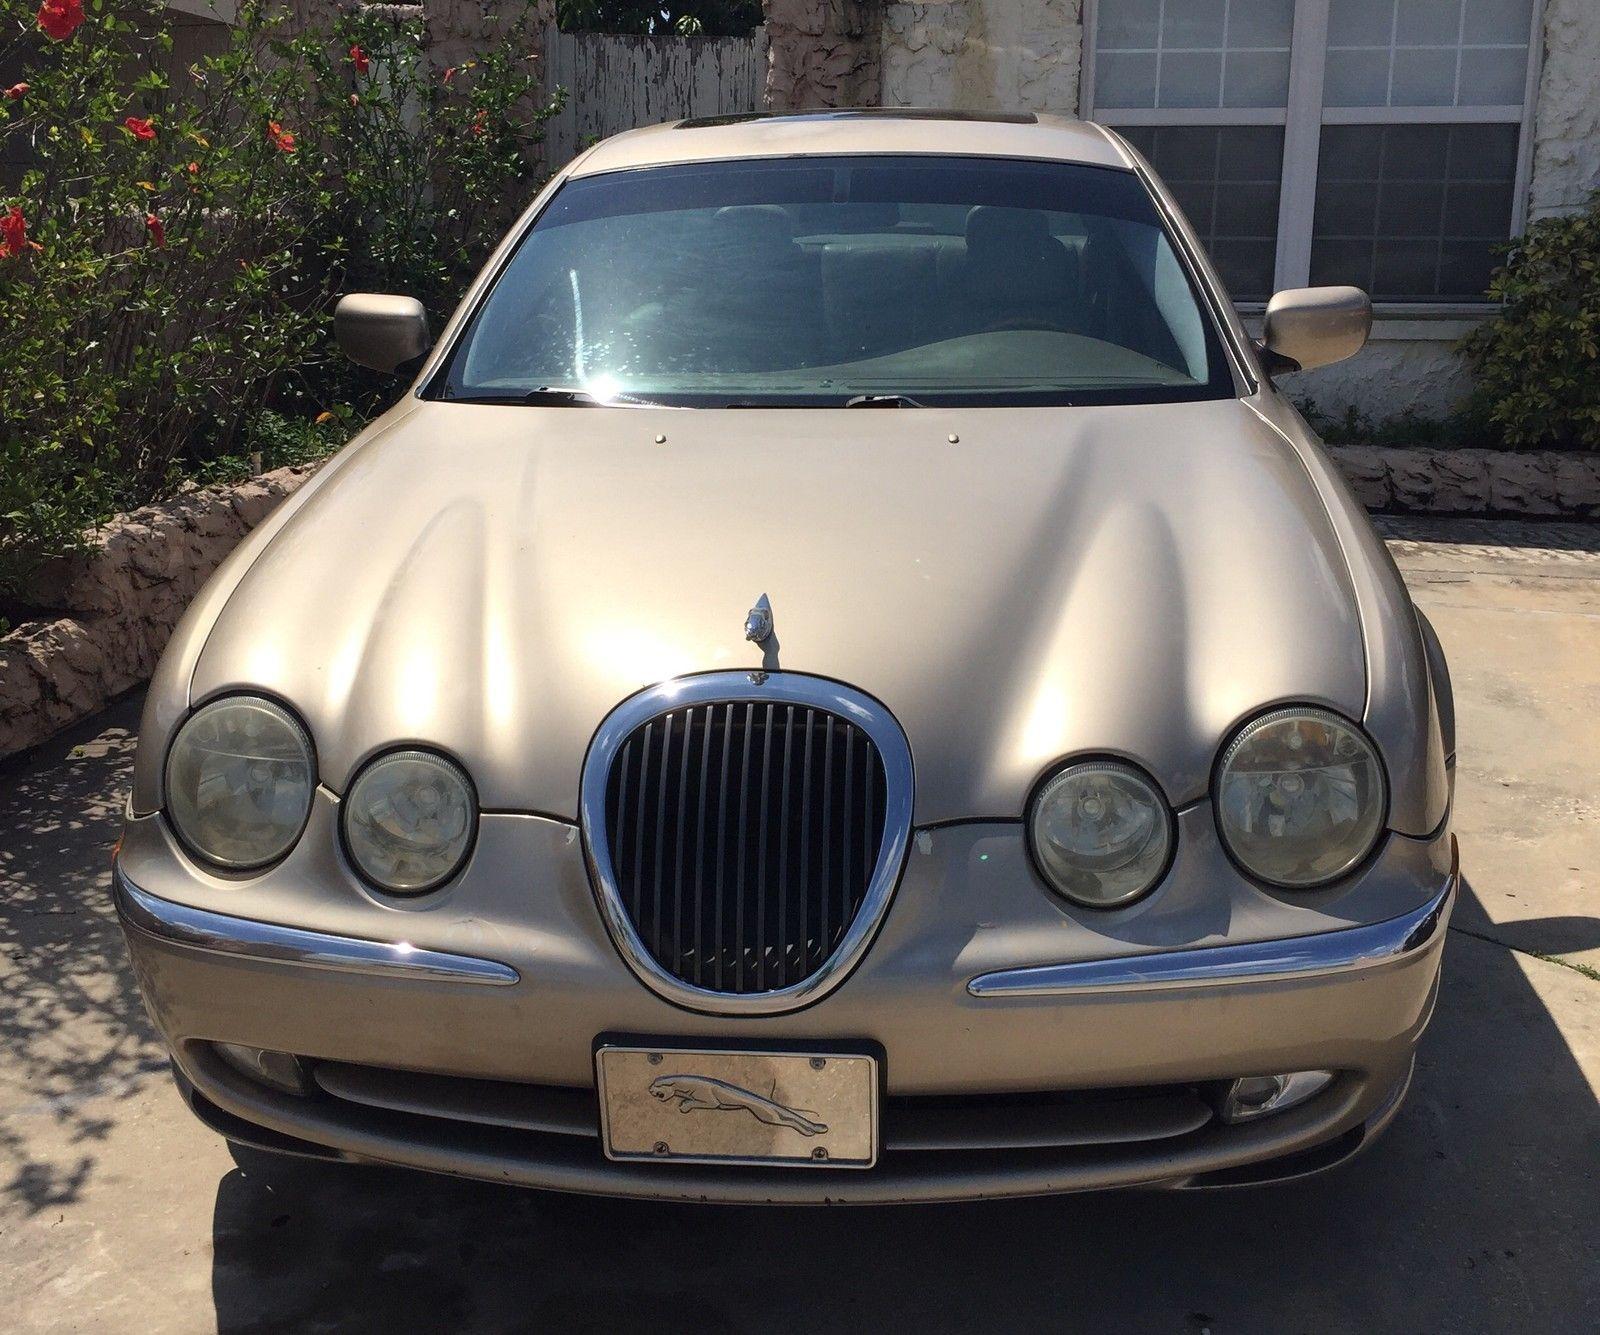 used s in type essex se sale jaguar rainham d cars for media saloon